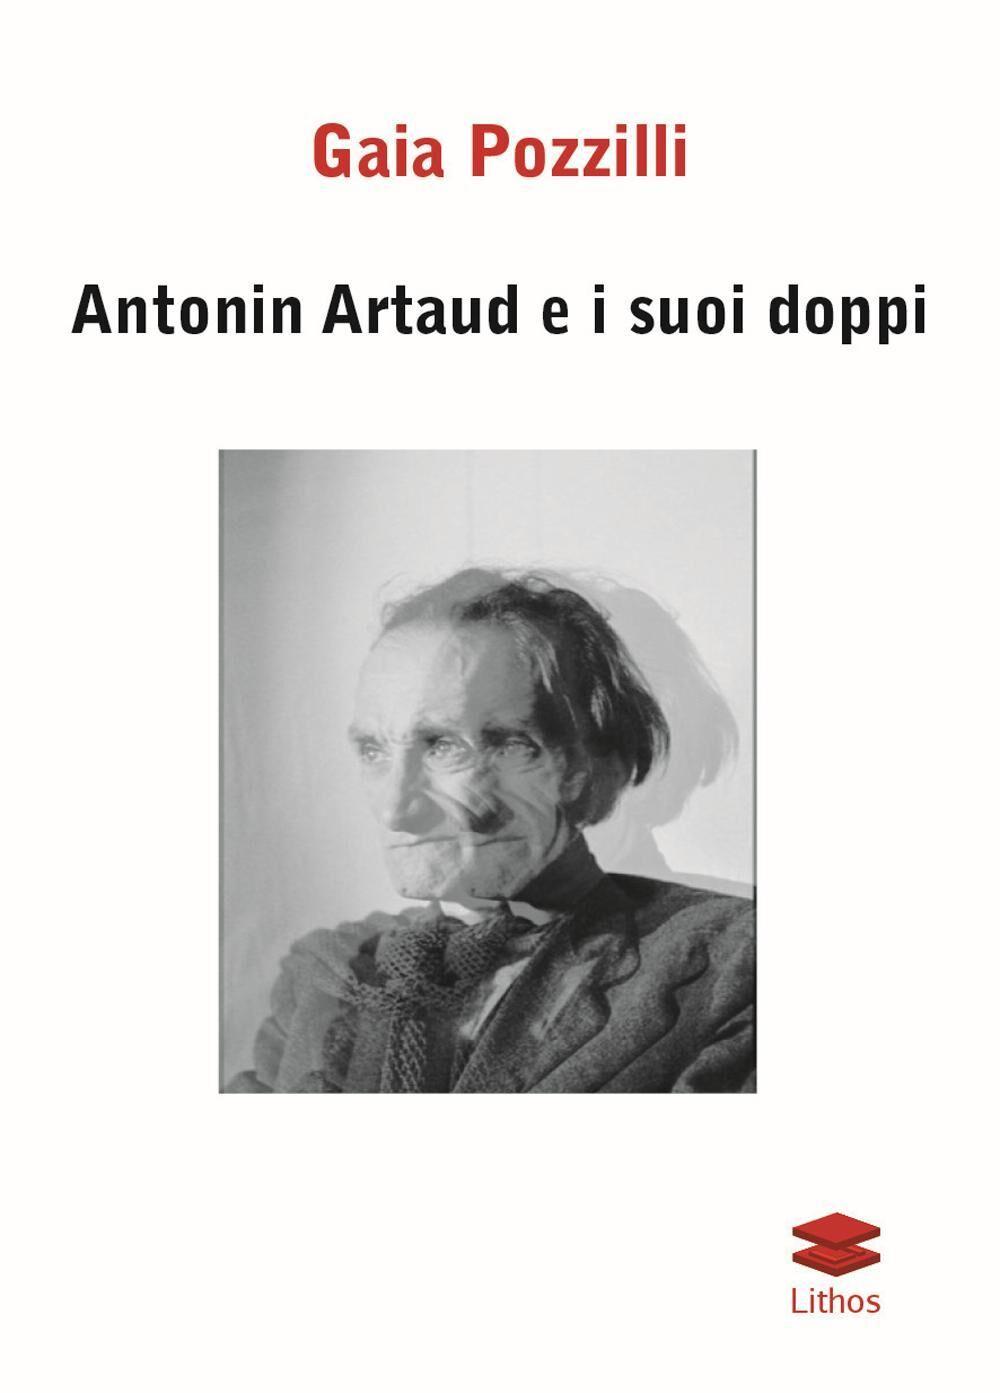 Antonin Artaud e i suoi doppi